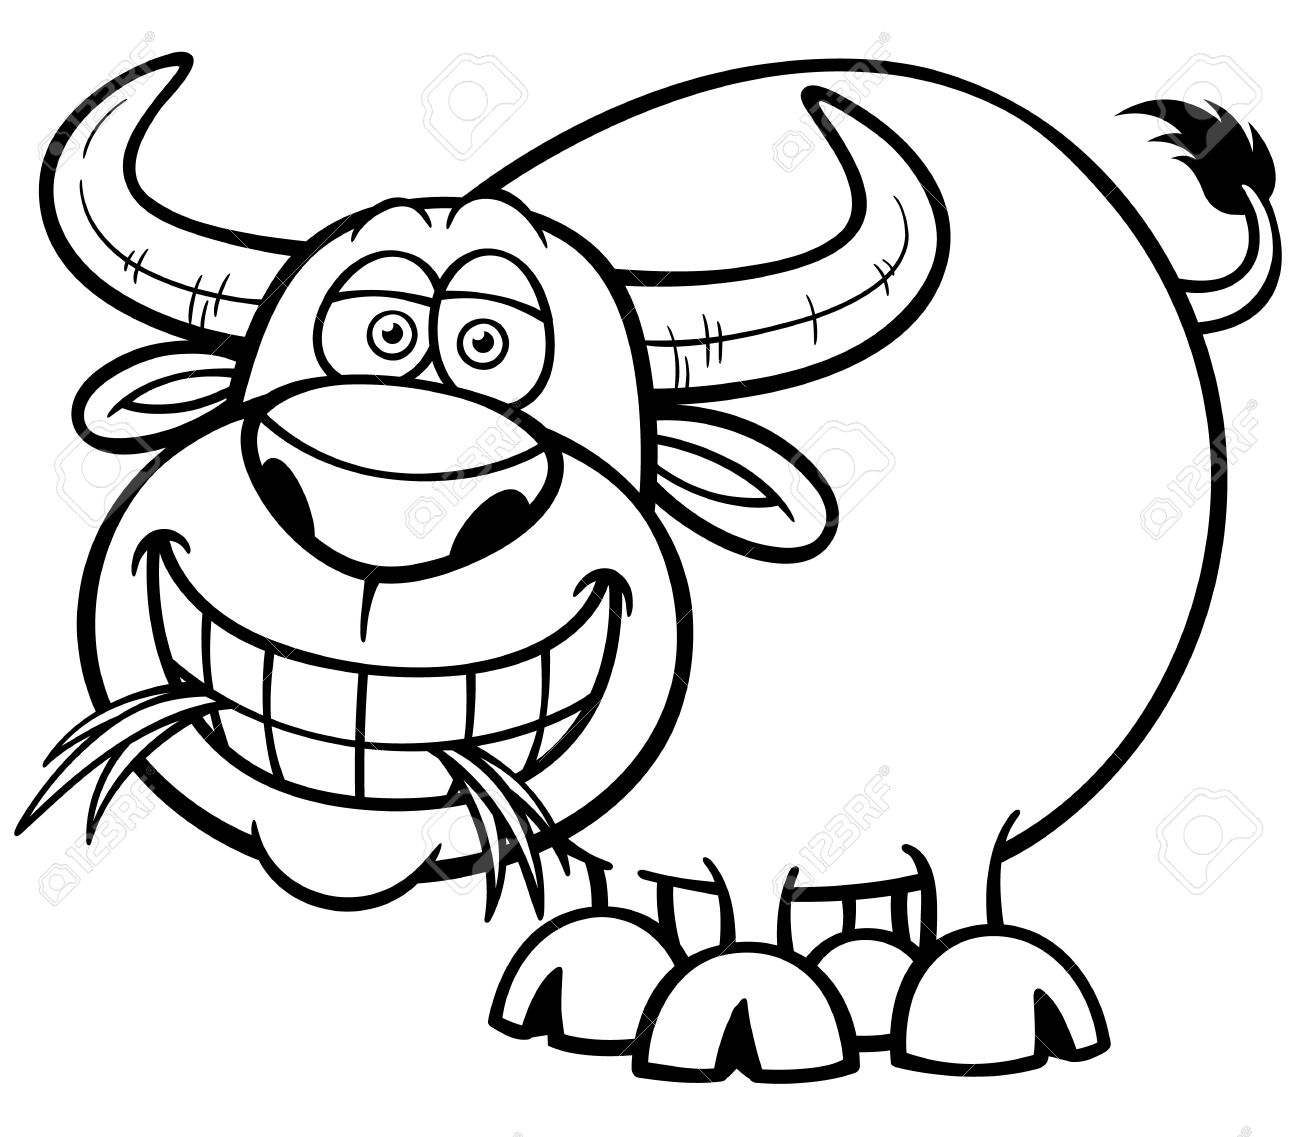 1300x1137 Illustration Of Cartoon Buffalo